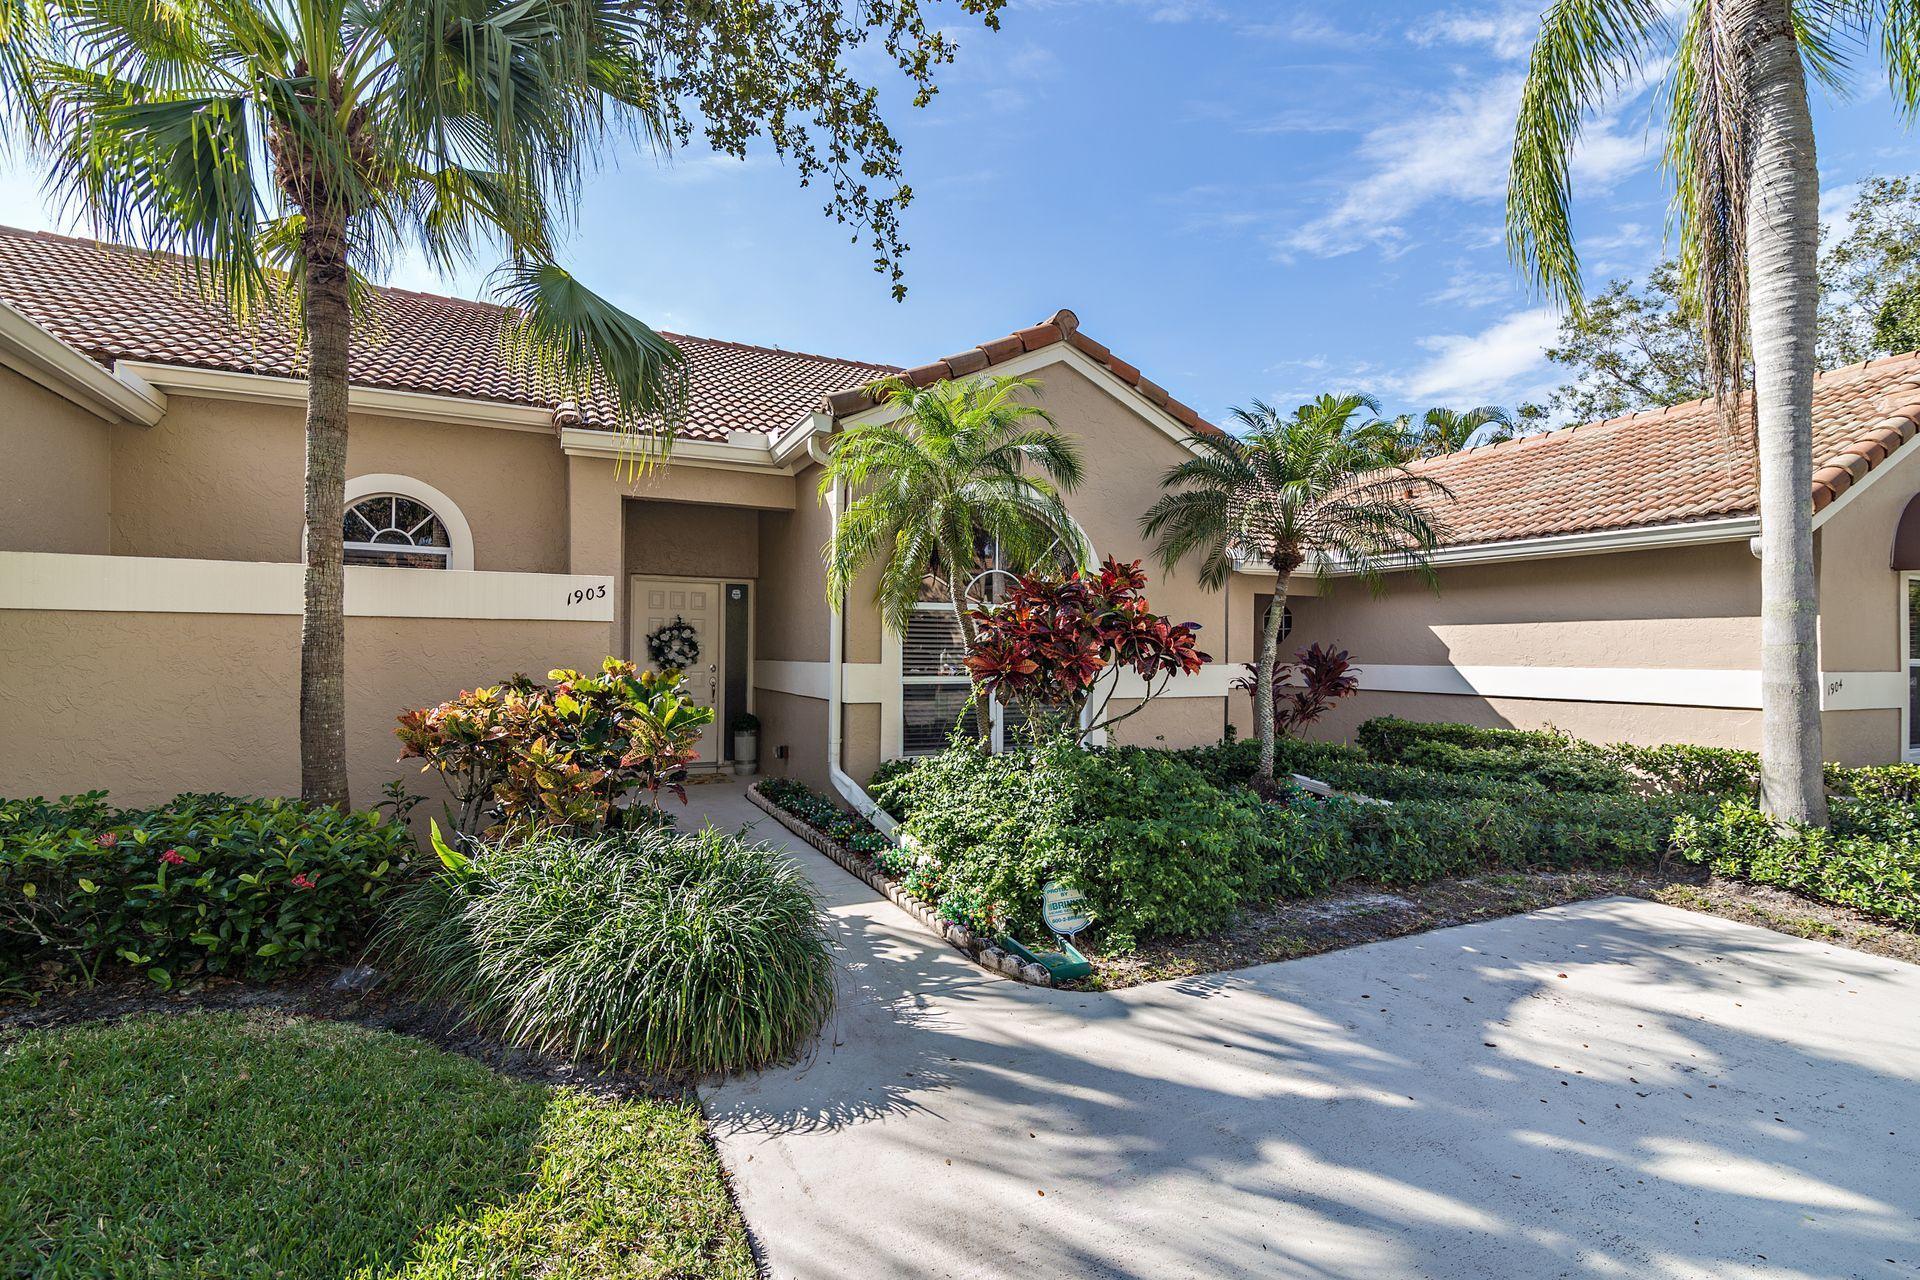 1903 Rosewood Way  Palm Beach Gardens FL 33418